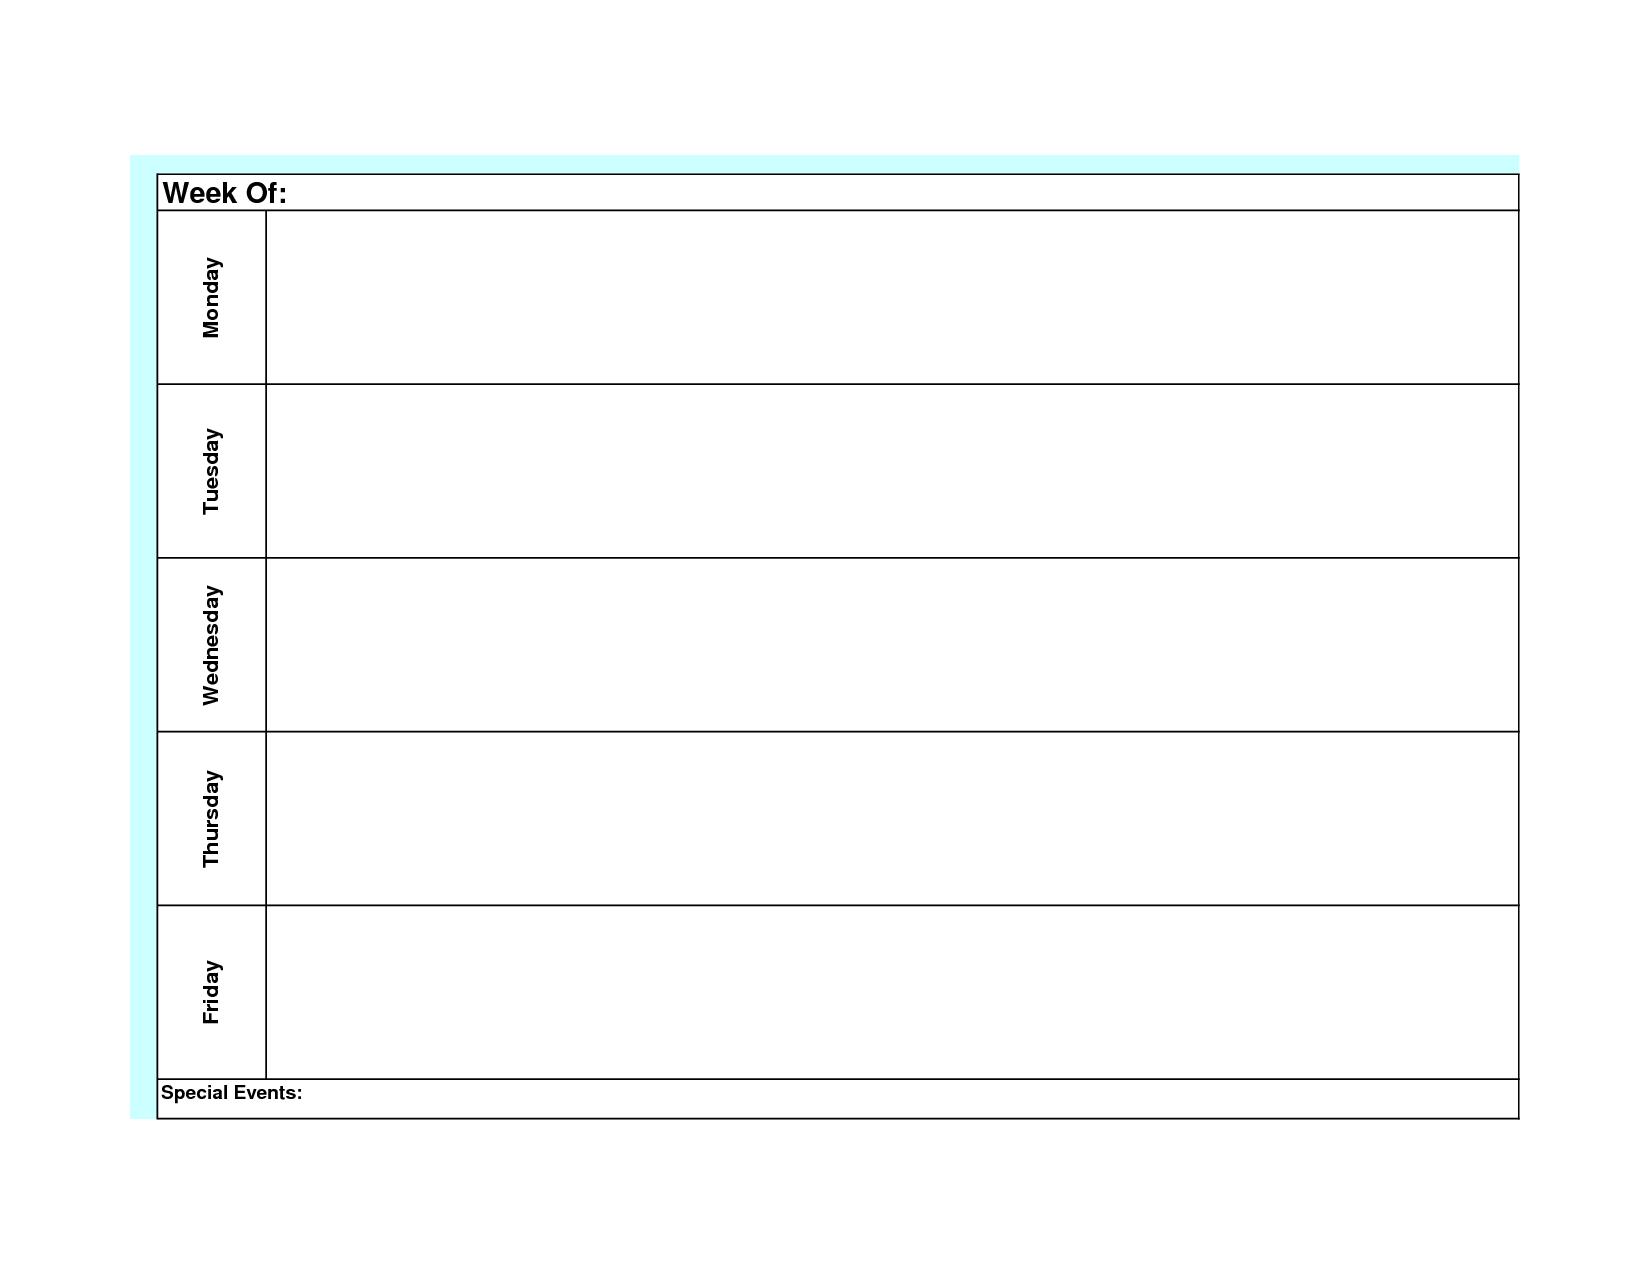 Blank Weekly Calendar Template Monday Friday   Planner   Weekly regarding Blank Weekly Monday Through Friday Calendar Template